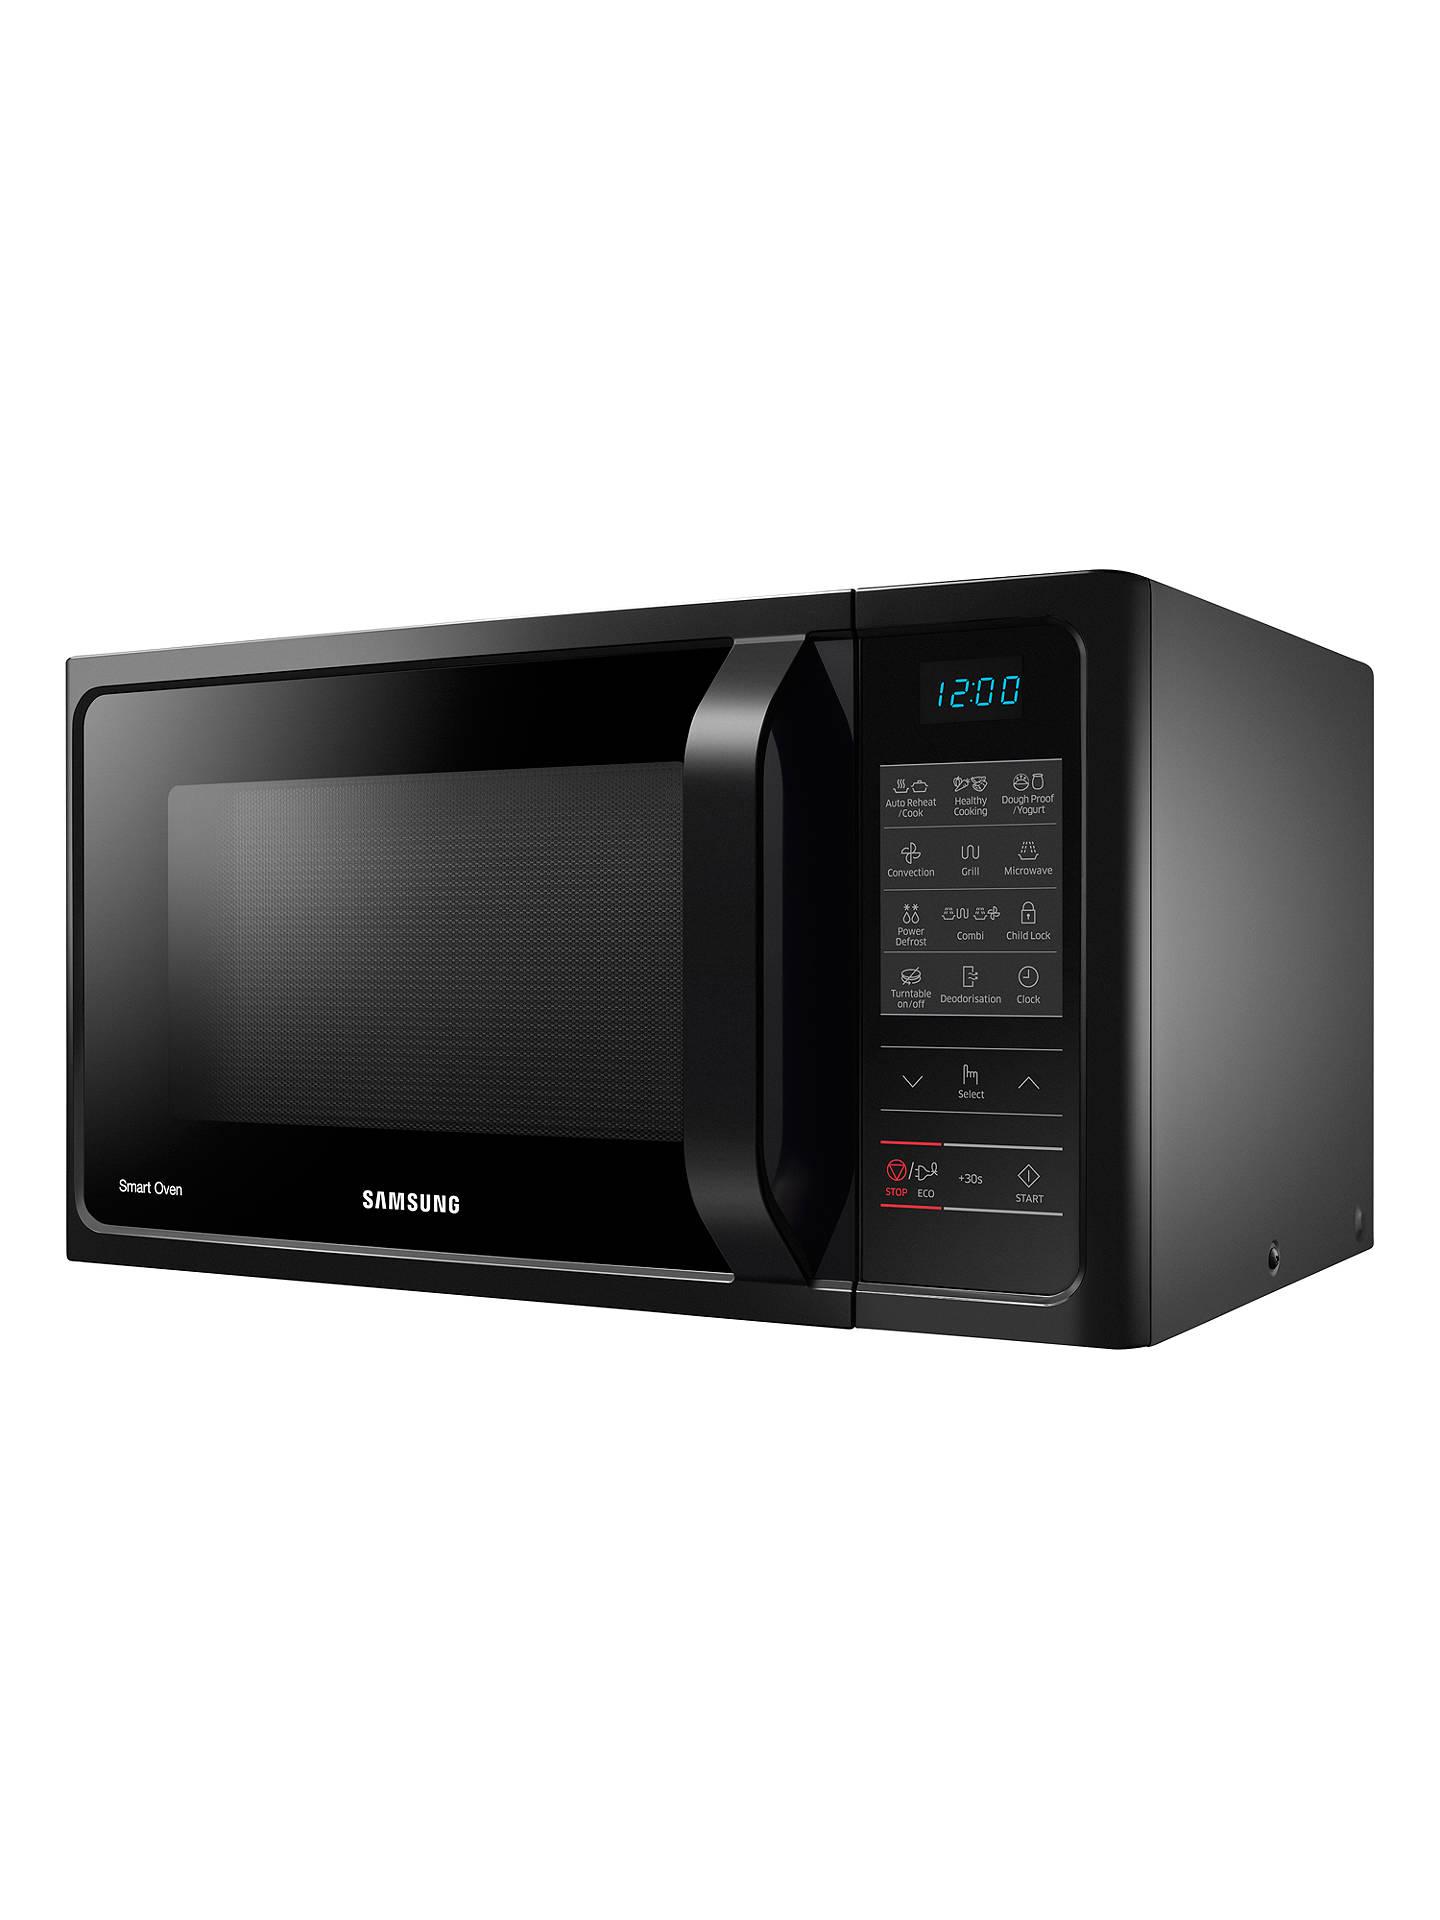 samsung mc28h5013ak combination microwave oven black at john lewis rh johnlewis com Samsung Tablet Ce0168 Instruction Manual Samsung User Manual Guide